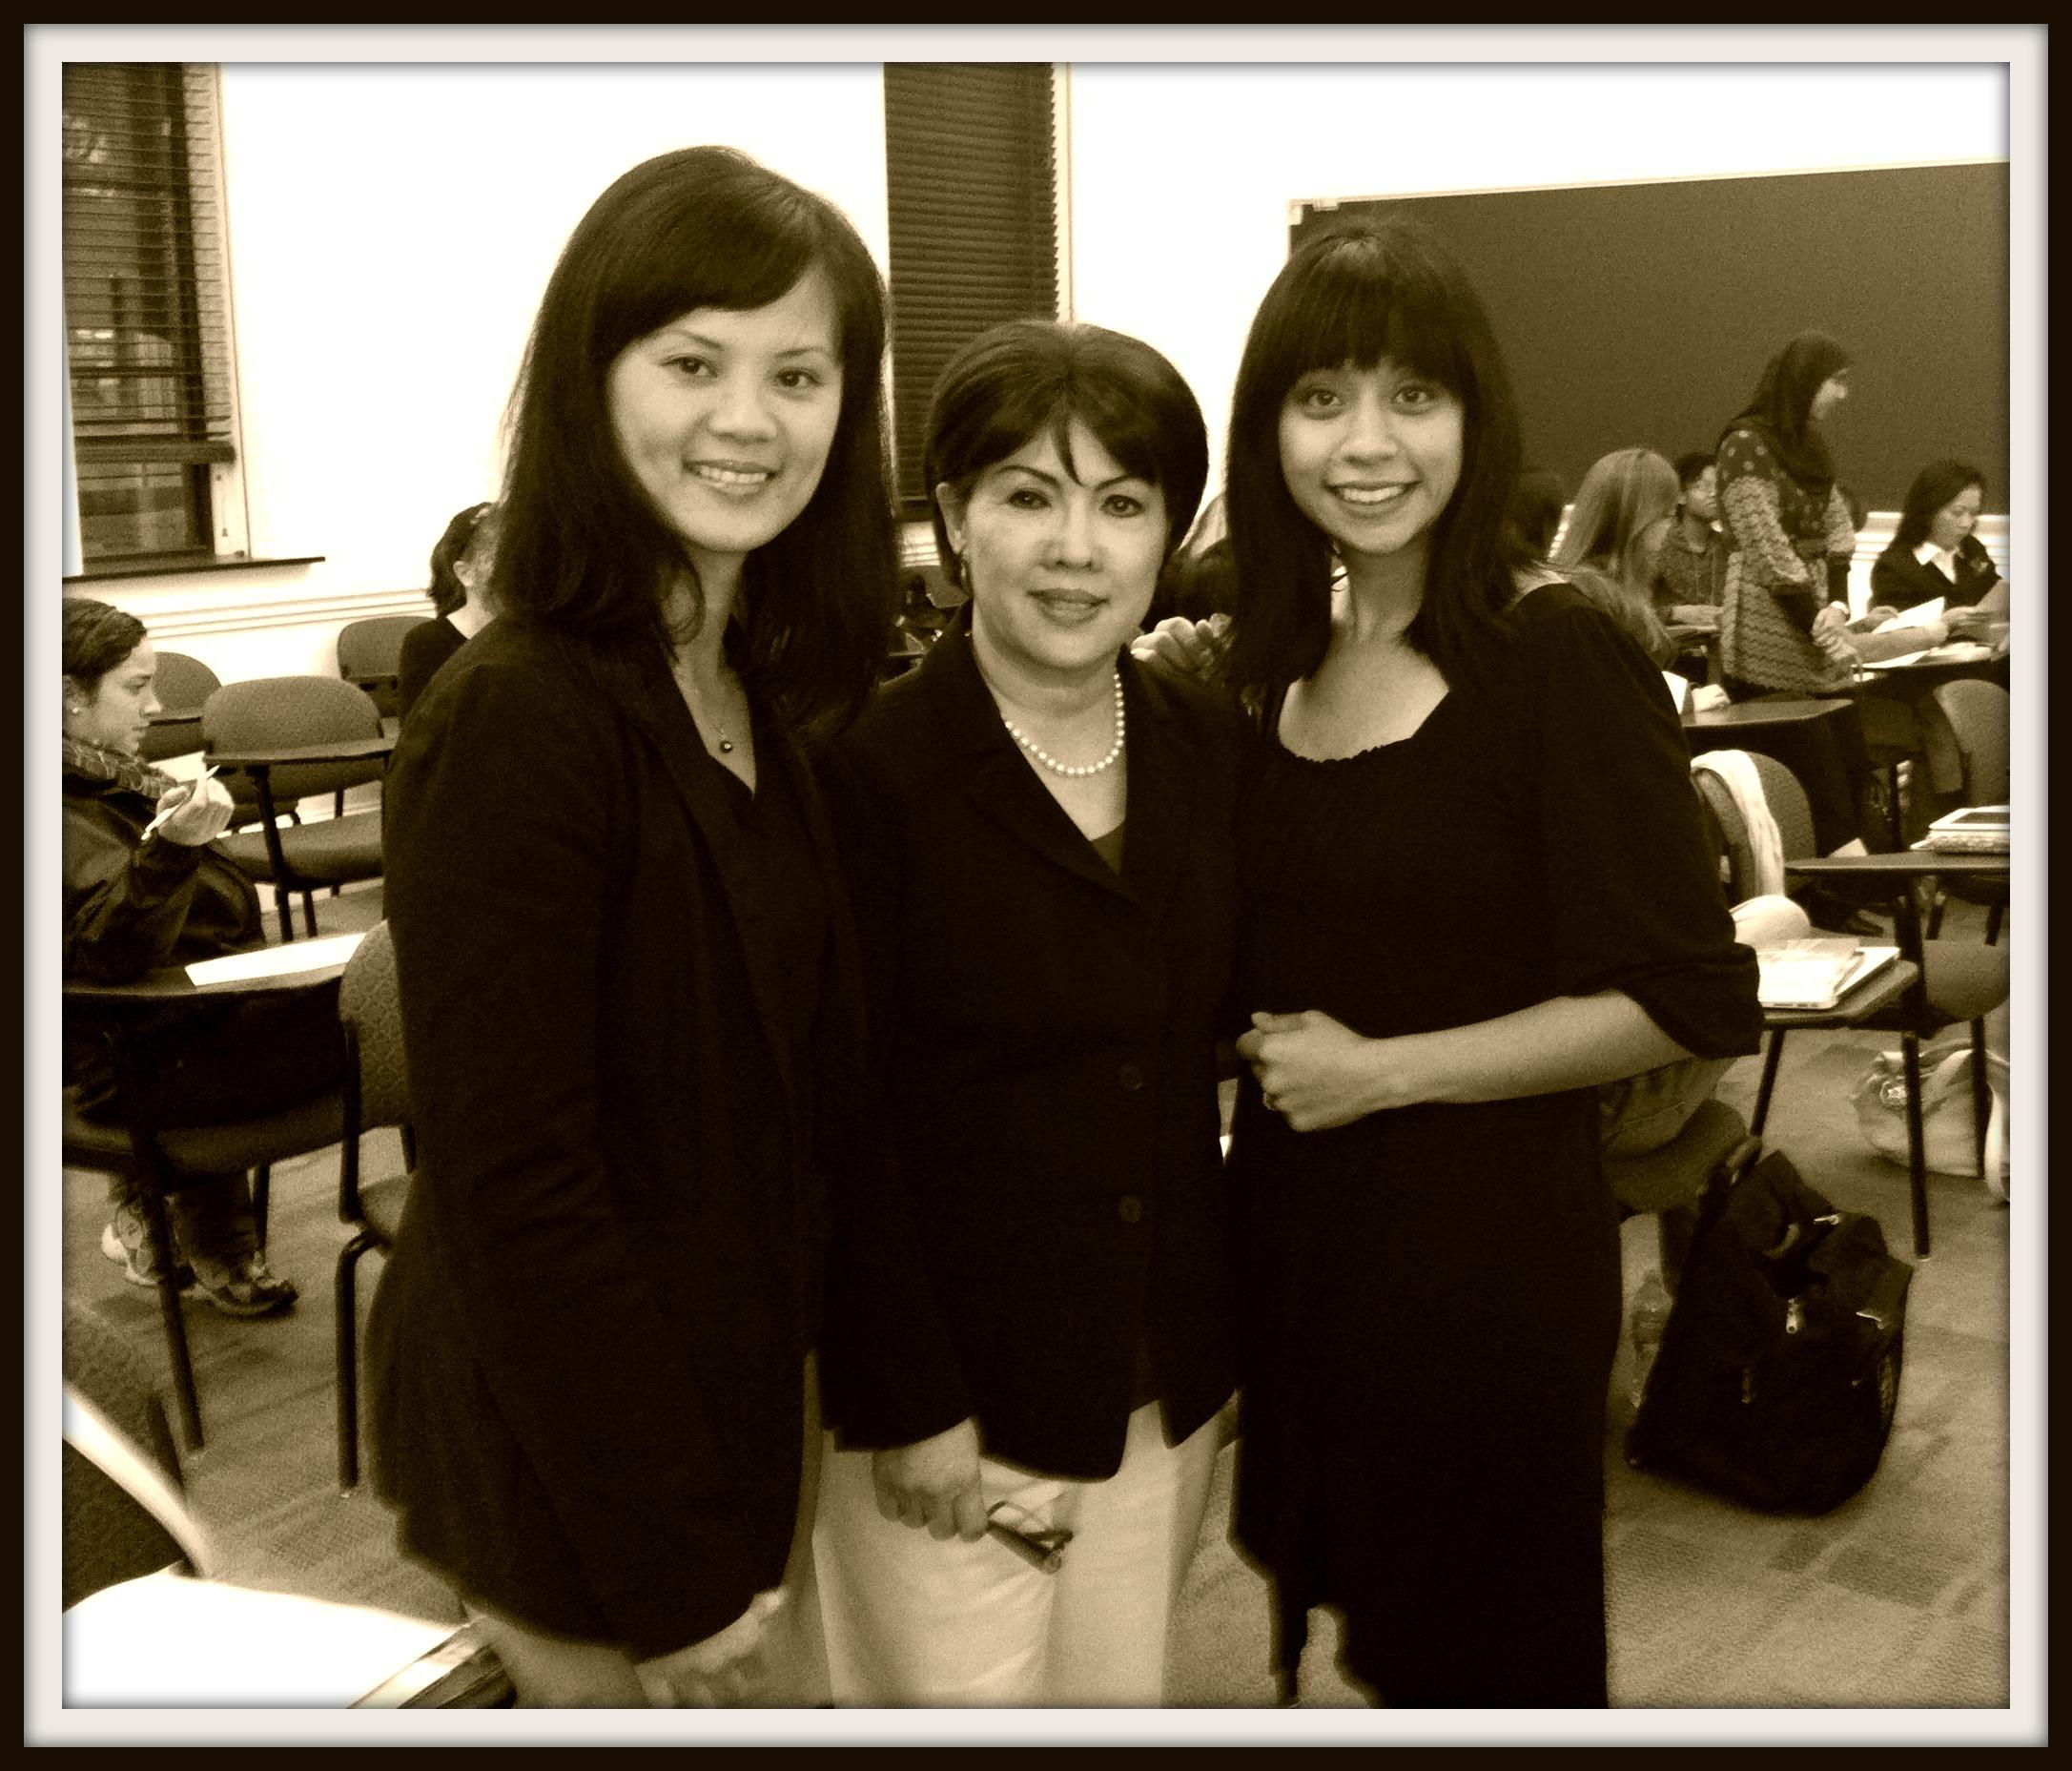 Thuy Vo Dang (VAOHP), Nancy Bui (VAHF), and Linda Ho Peche (VAHF)